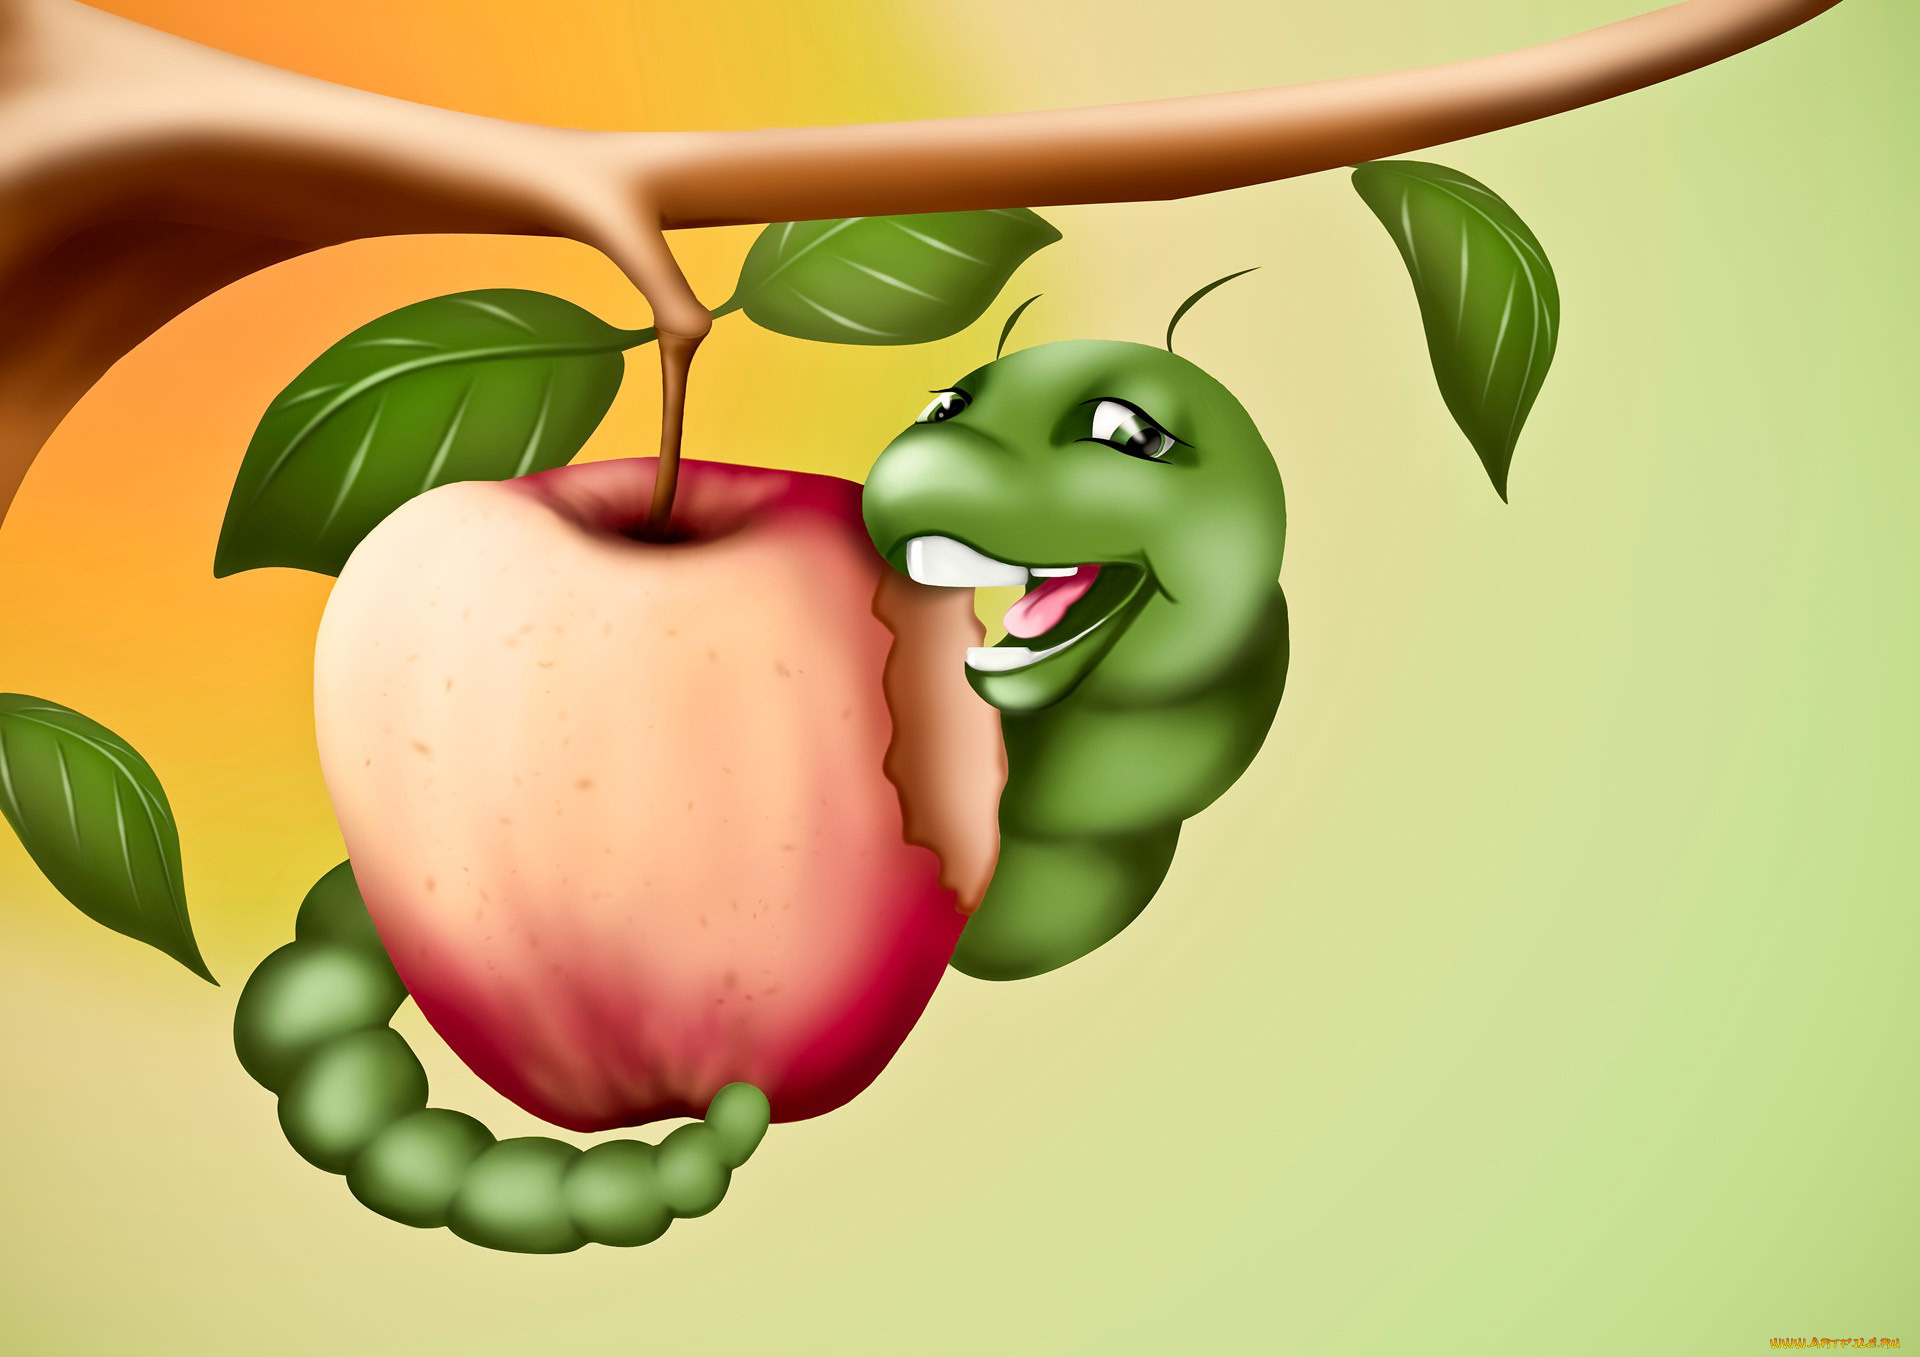 Квартиру картинки, смешное яблоко картинки